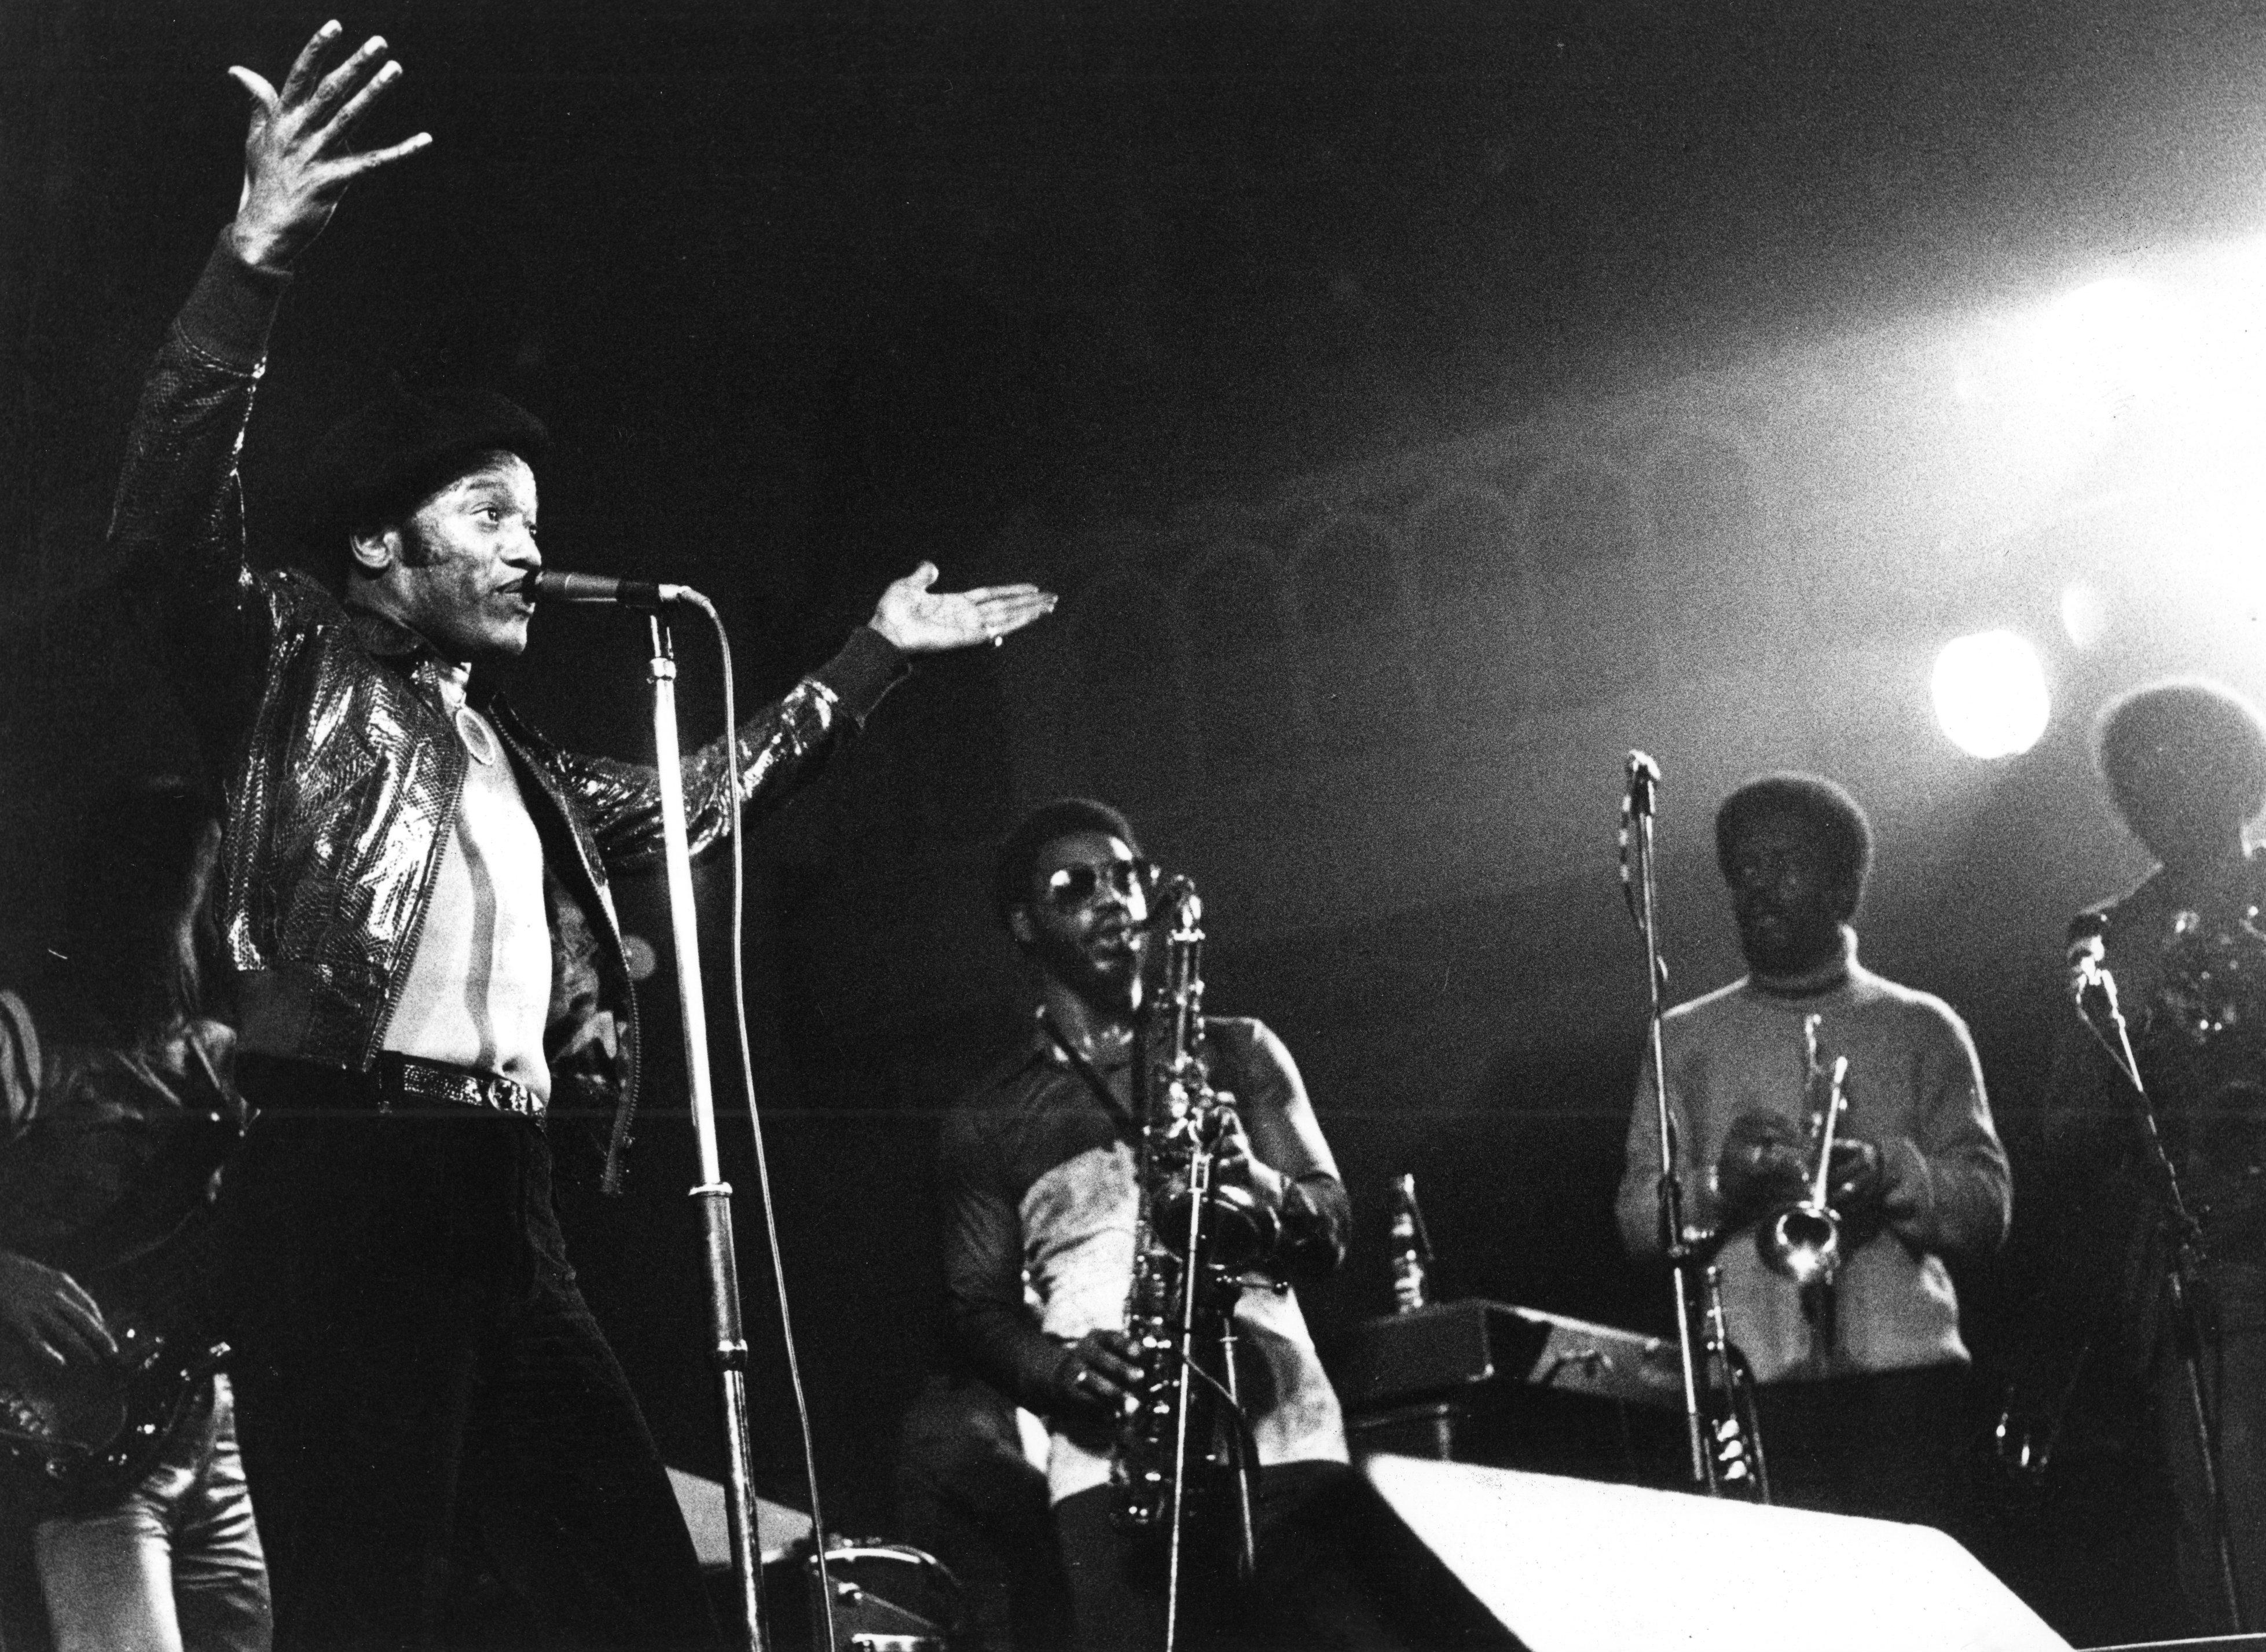 AMSTERDAM, NETHERLANDS: Bobby Womack performs live in Amsterdam, Netherlands in 1976 (Photo by Gijsbert Hanekroot/Redferns)